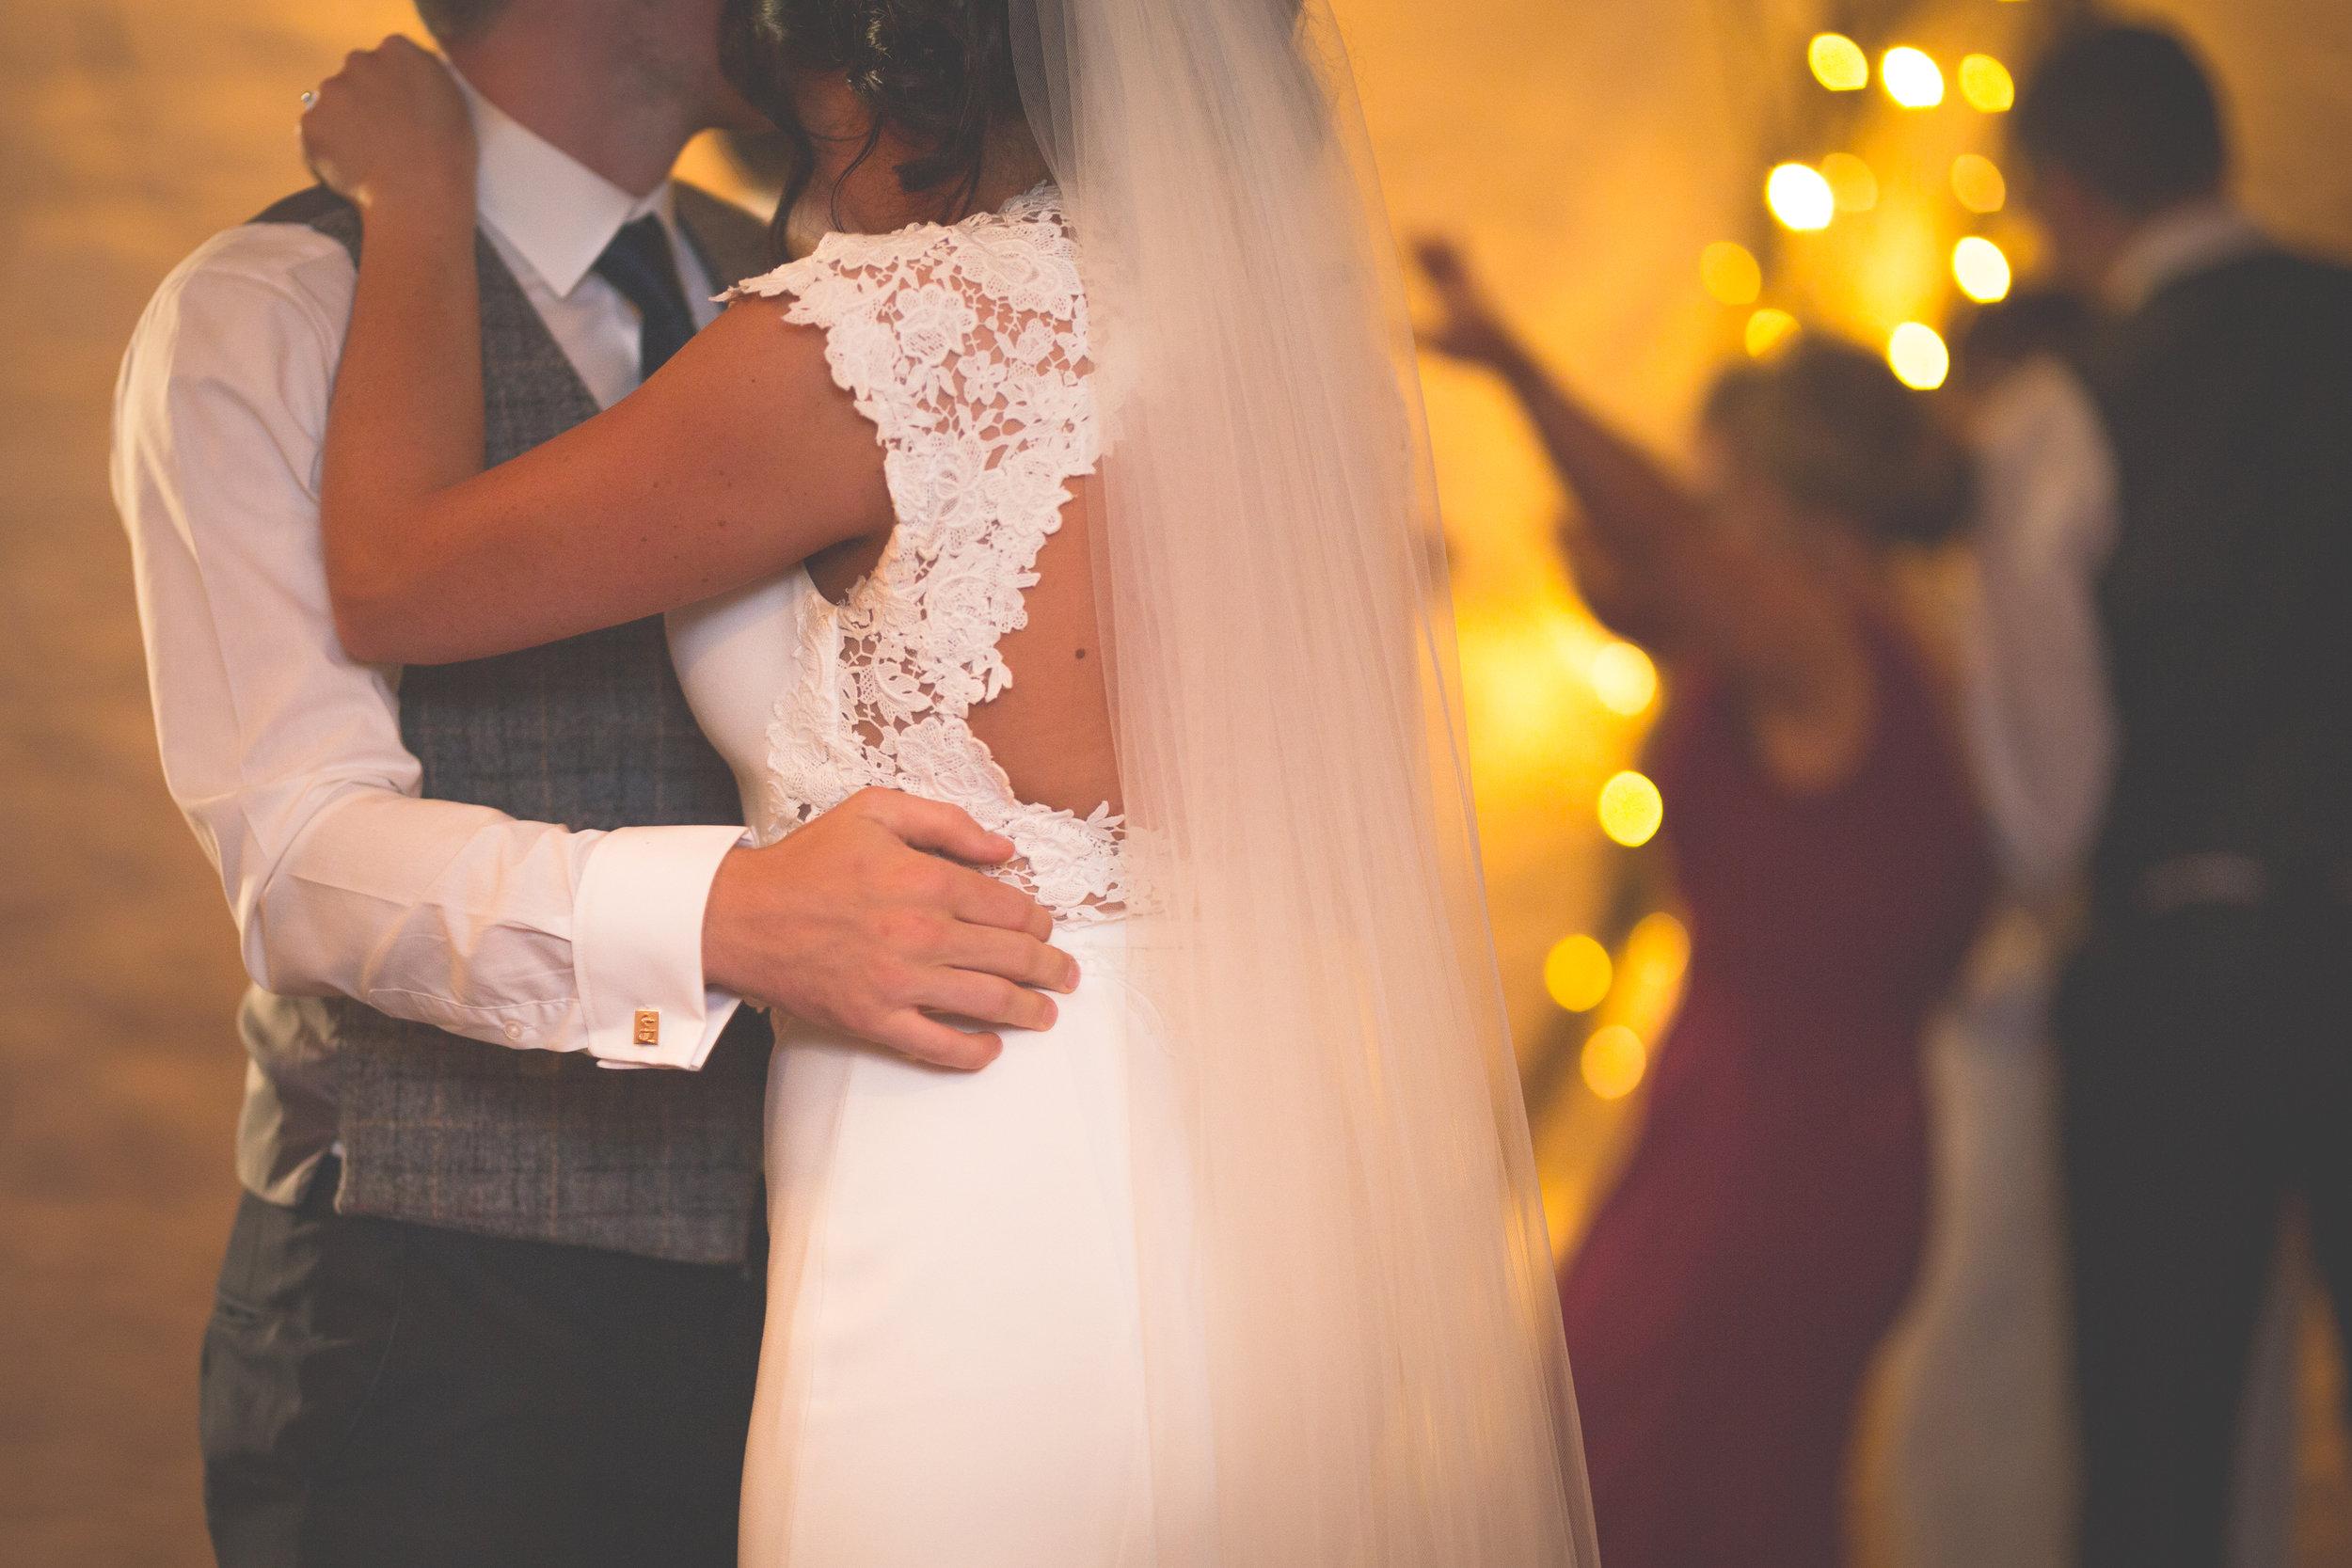 Brian McEwan Wedding Photography | Carol-Annee & Sean | The Dancing-40.jpg